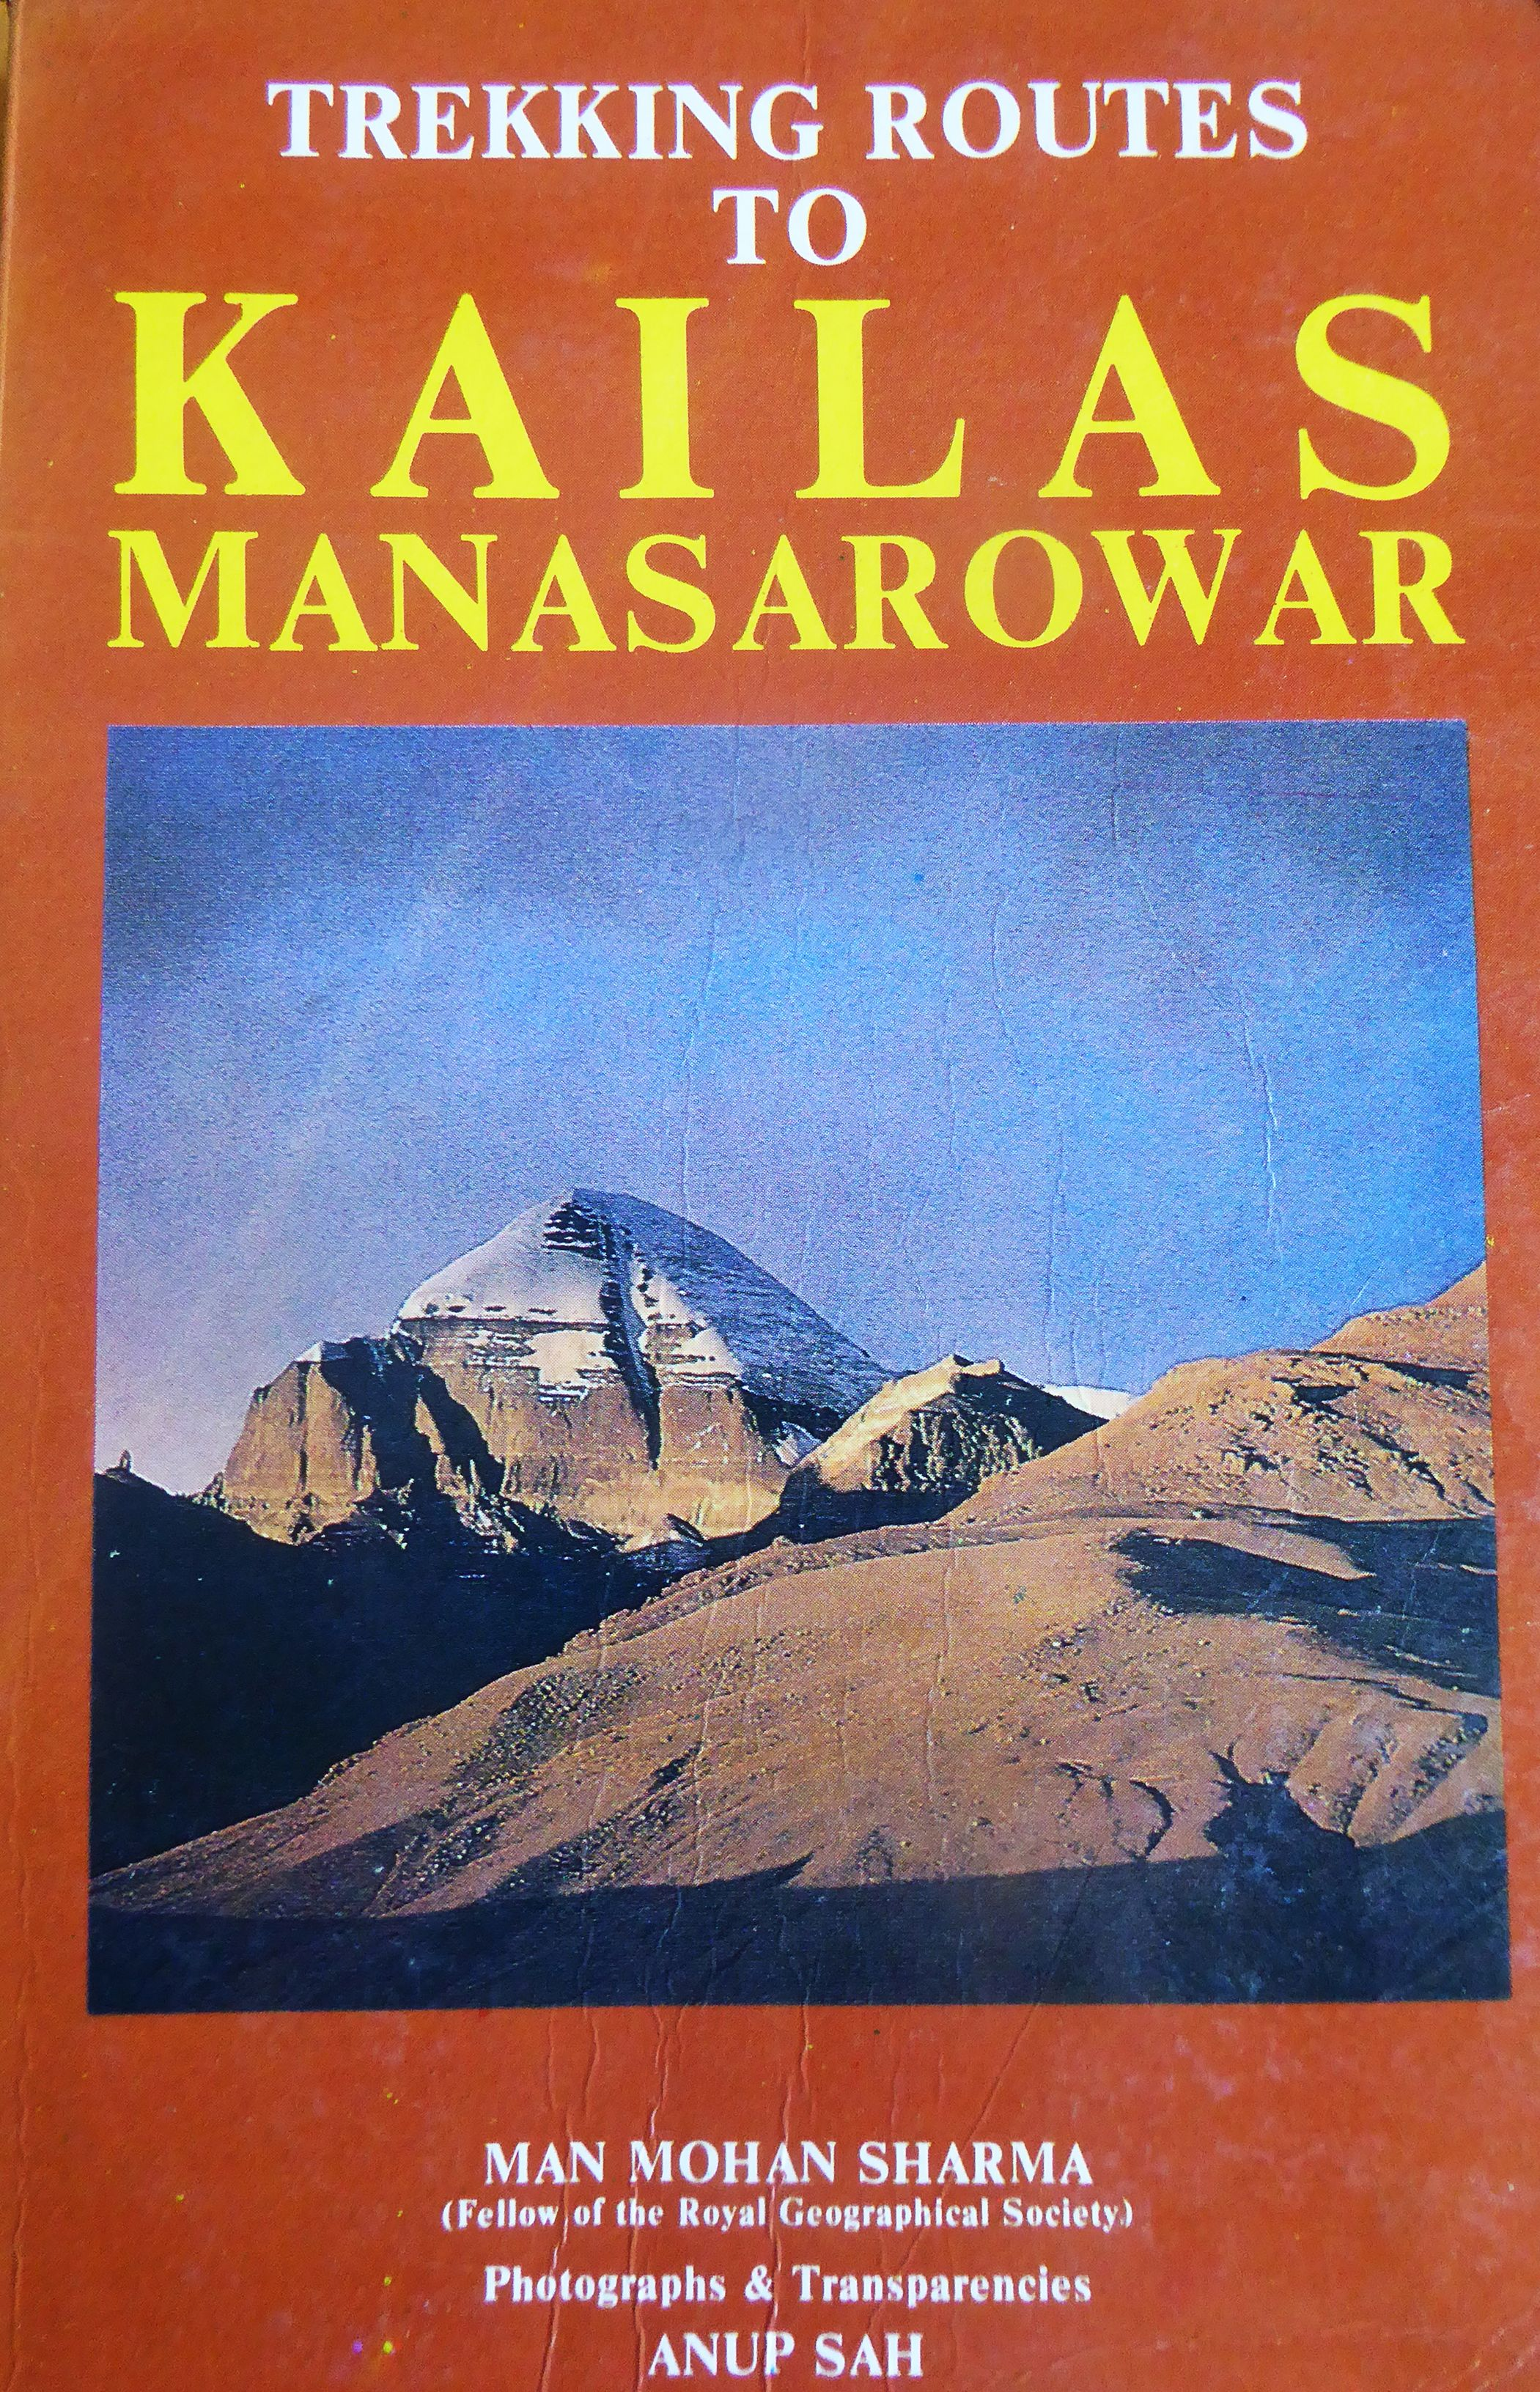 Trekking Routes to Kailas Manasarovar by Man Mohan Sharma